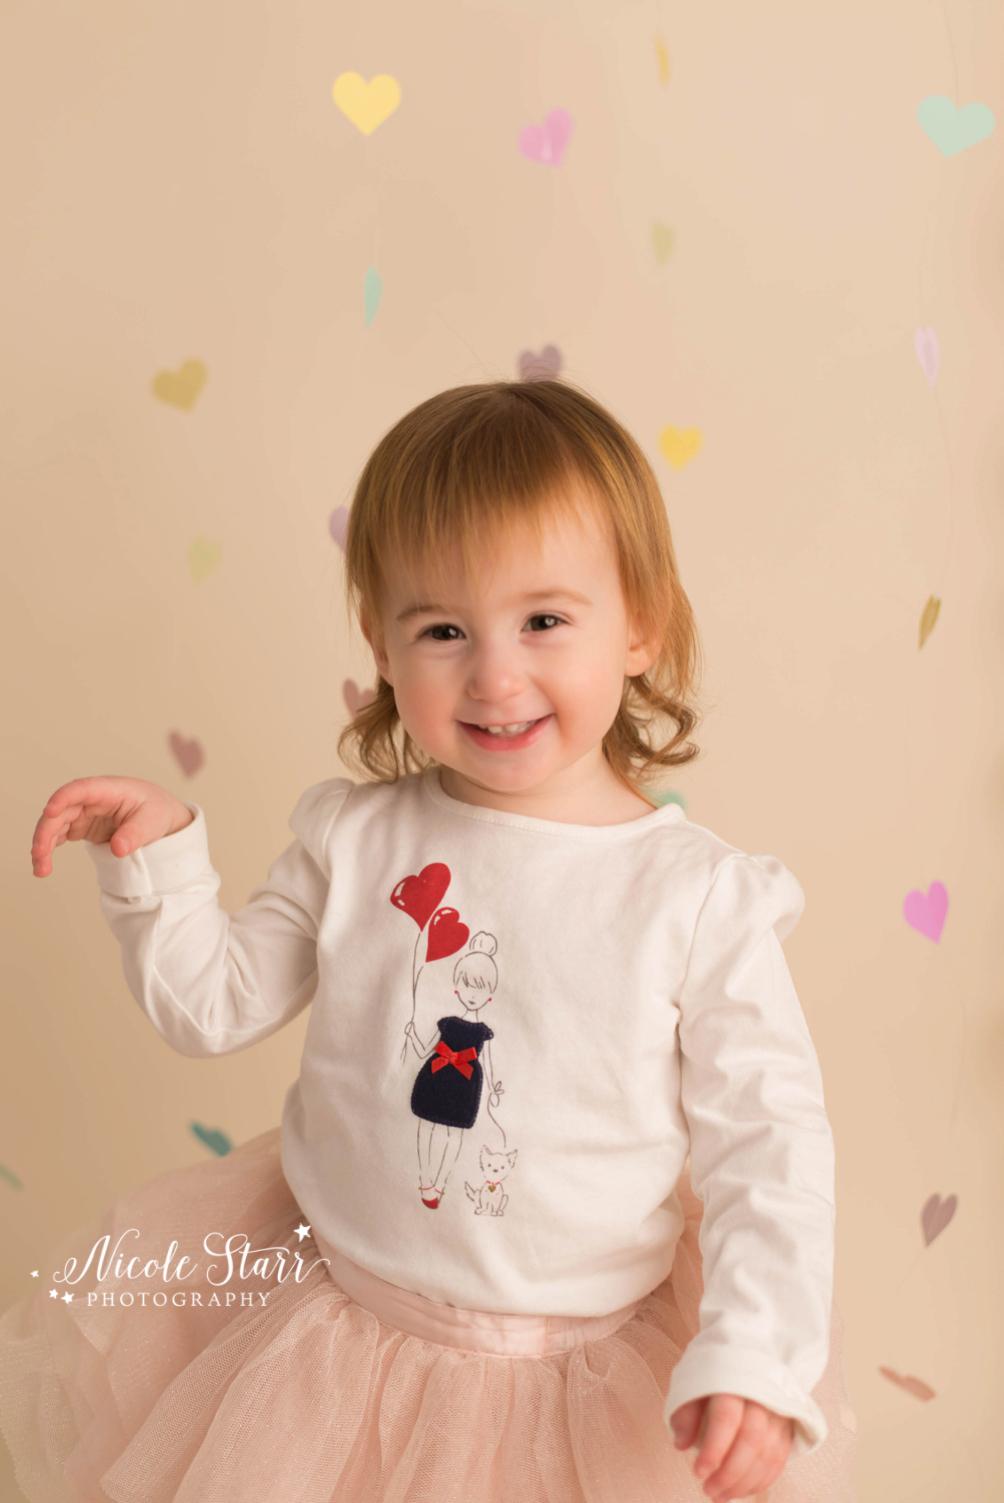 upstate new york saratoga albany ny valentines day baby photographer_0013.jpg